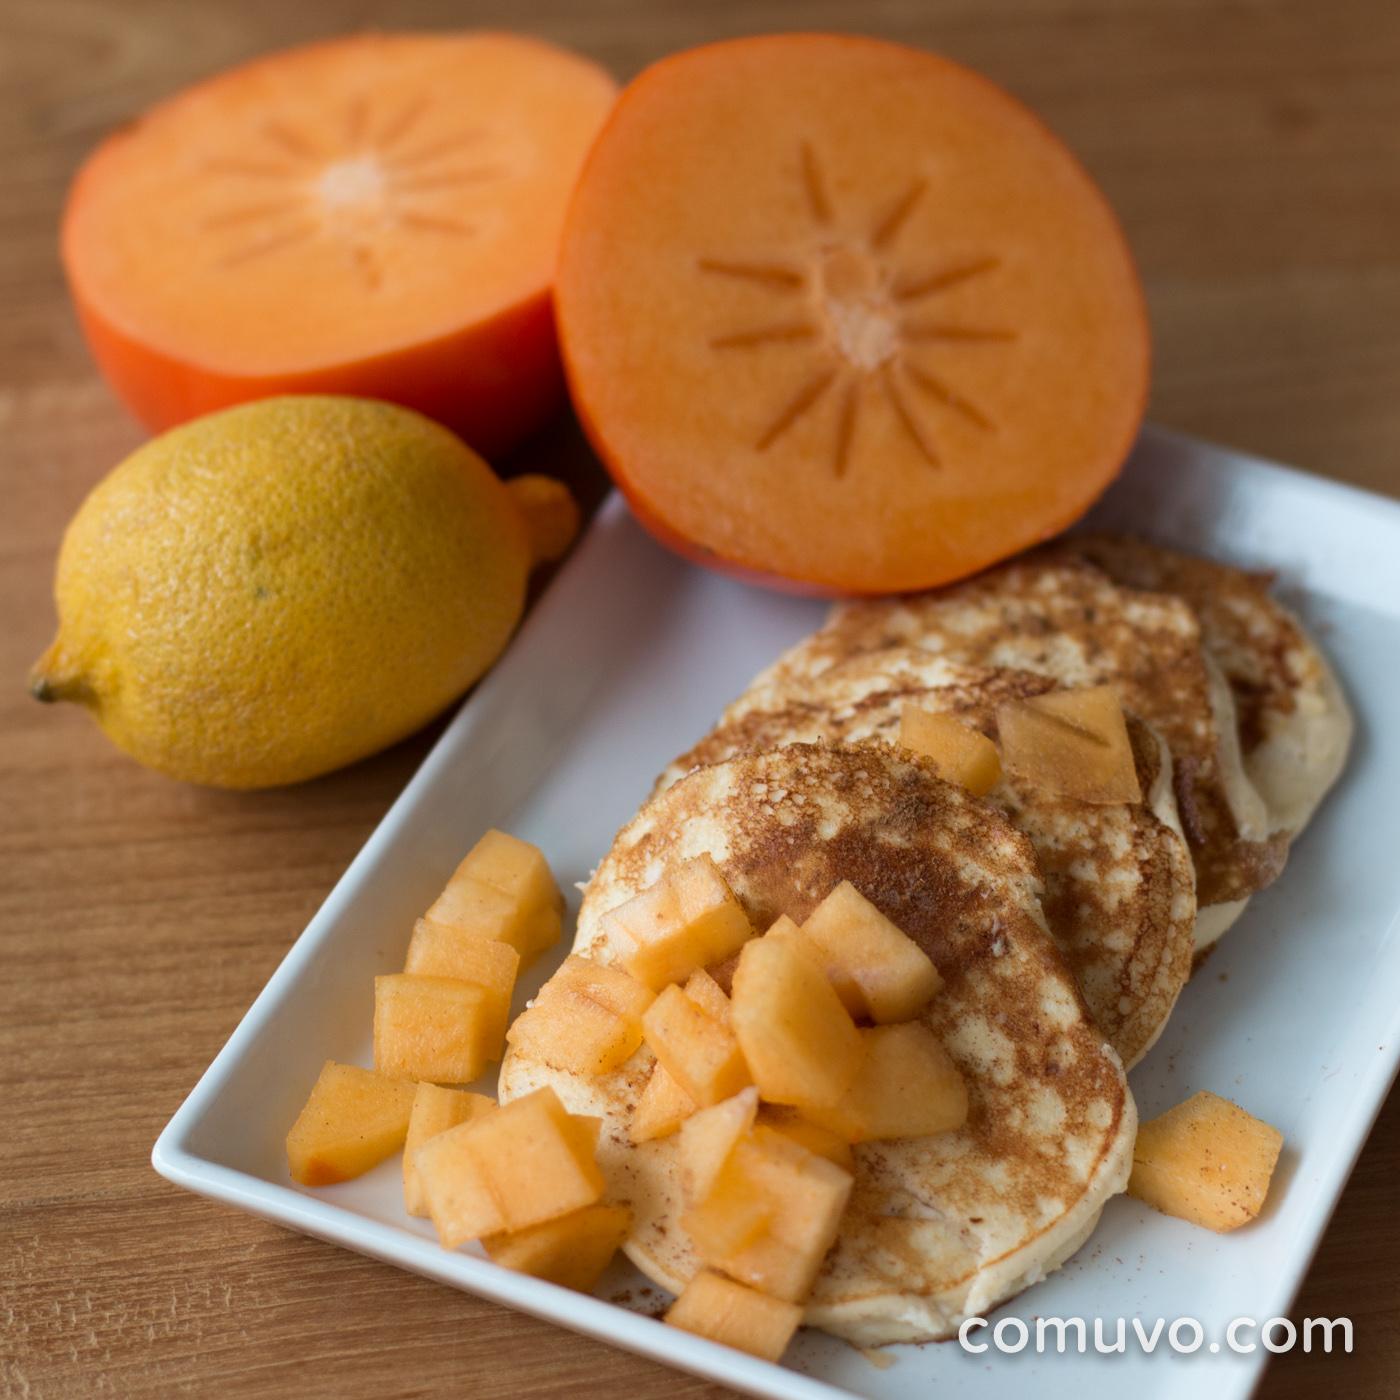 Rezept Low Carb Pancakes & Overnight Oat Schoko Banane | comuvo